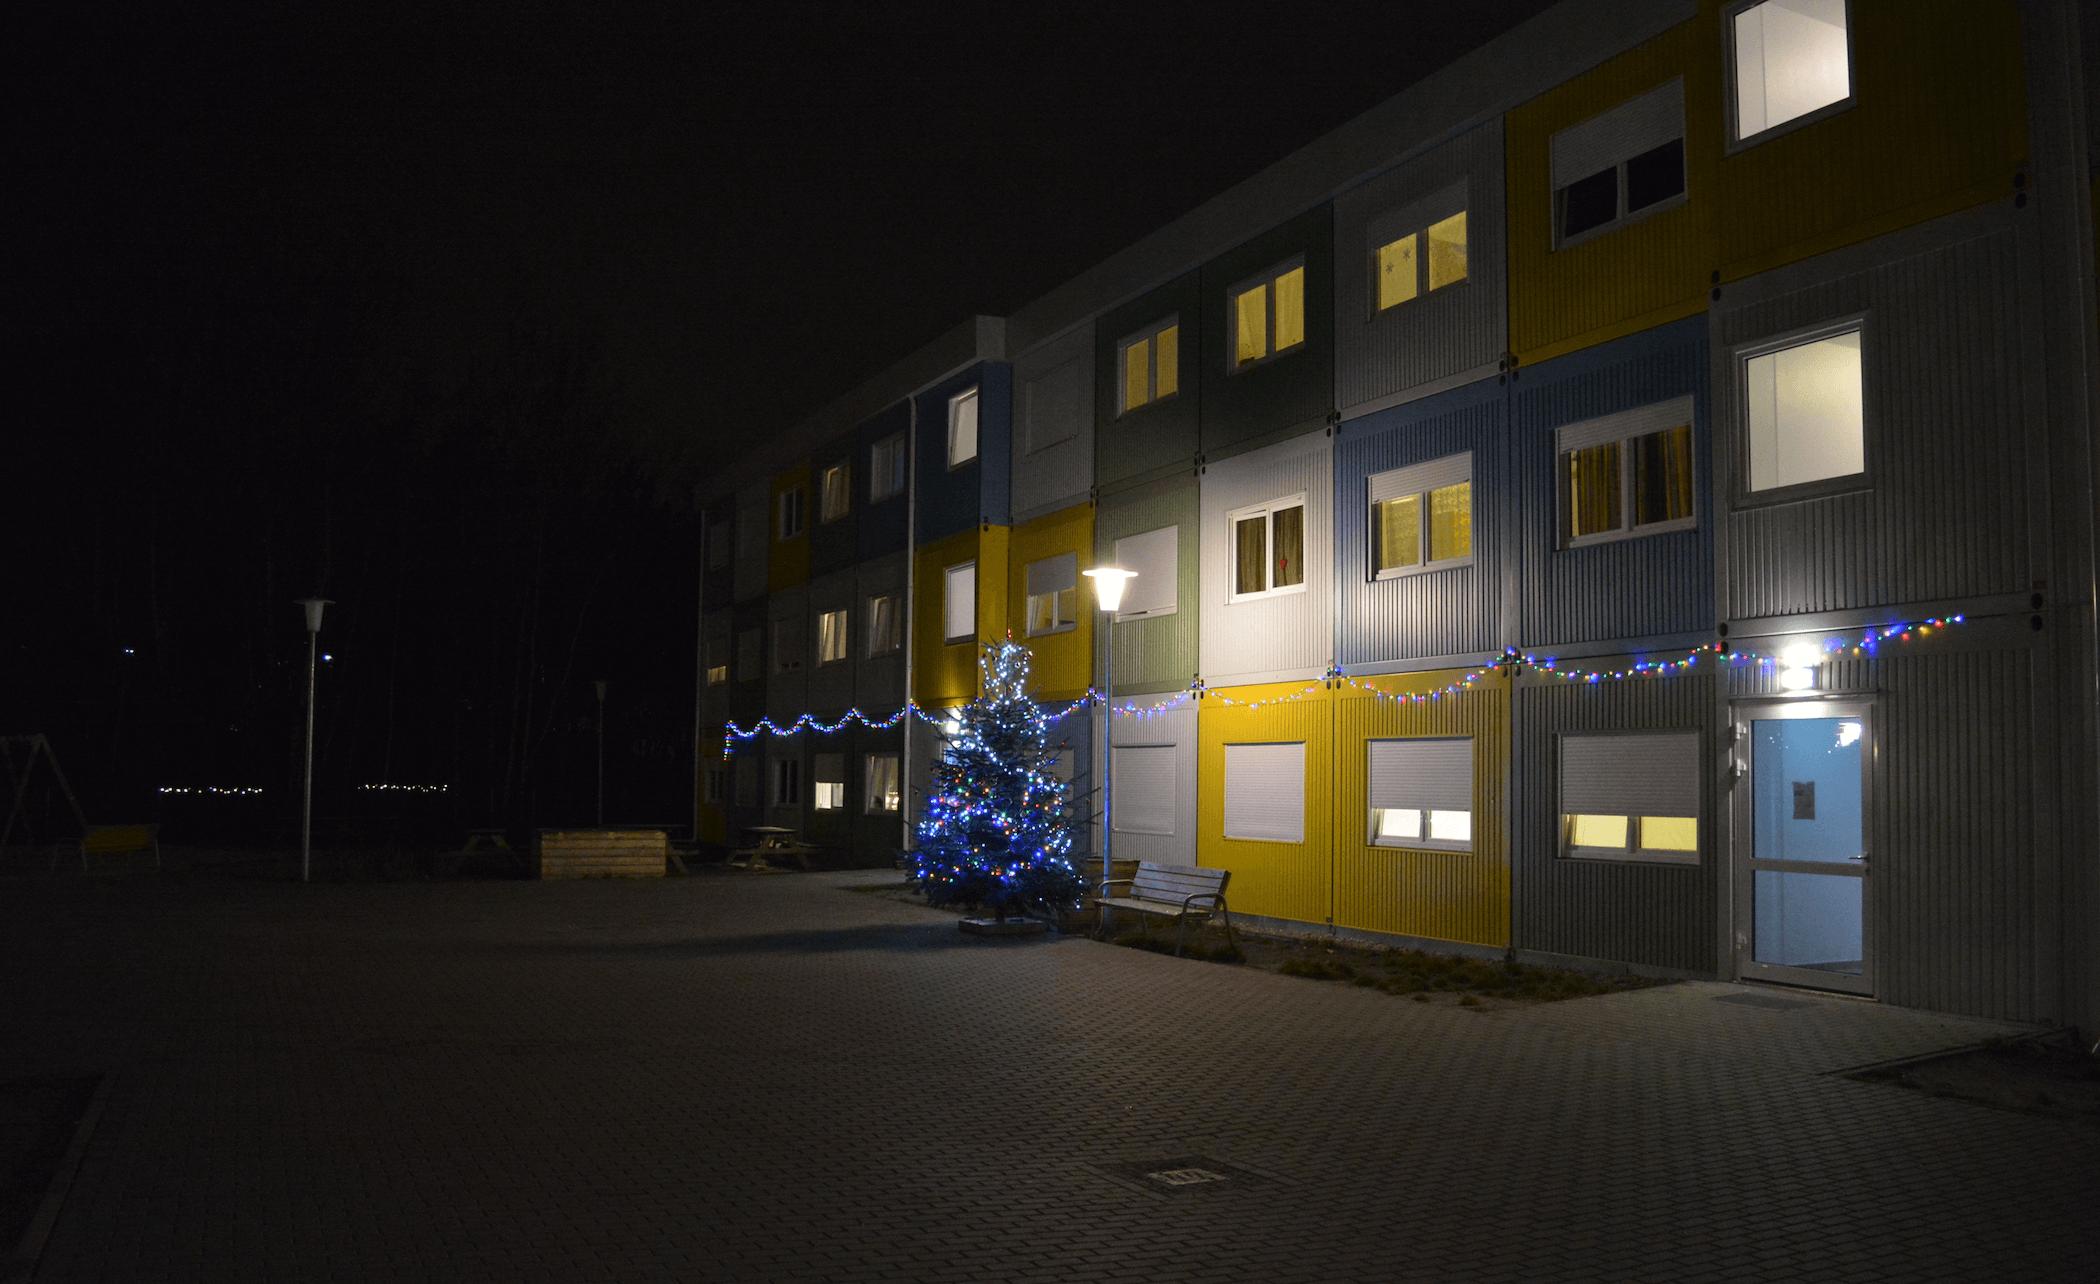 Weihnachtsbaum Fluechtlingsunterkunft